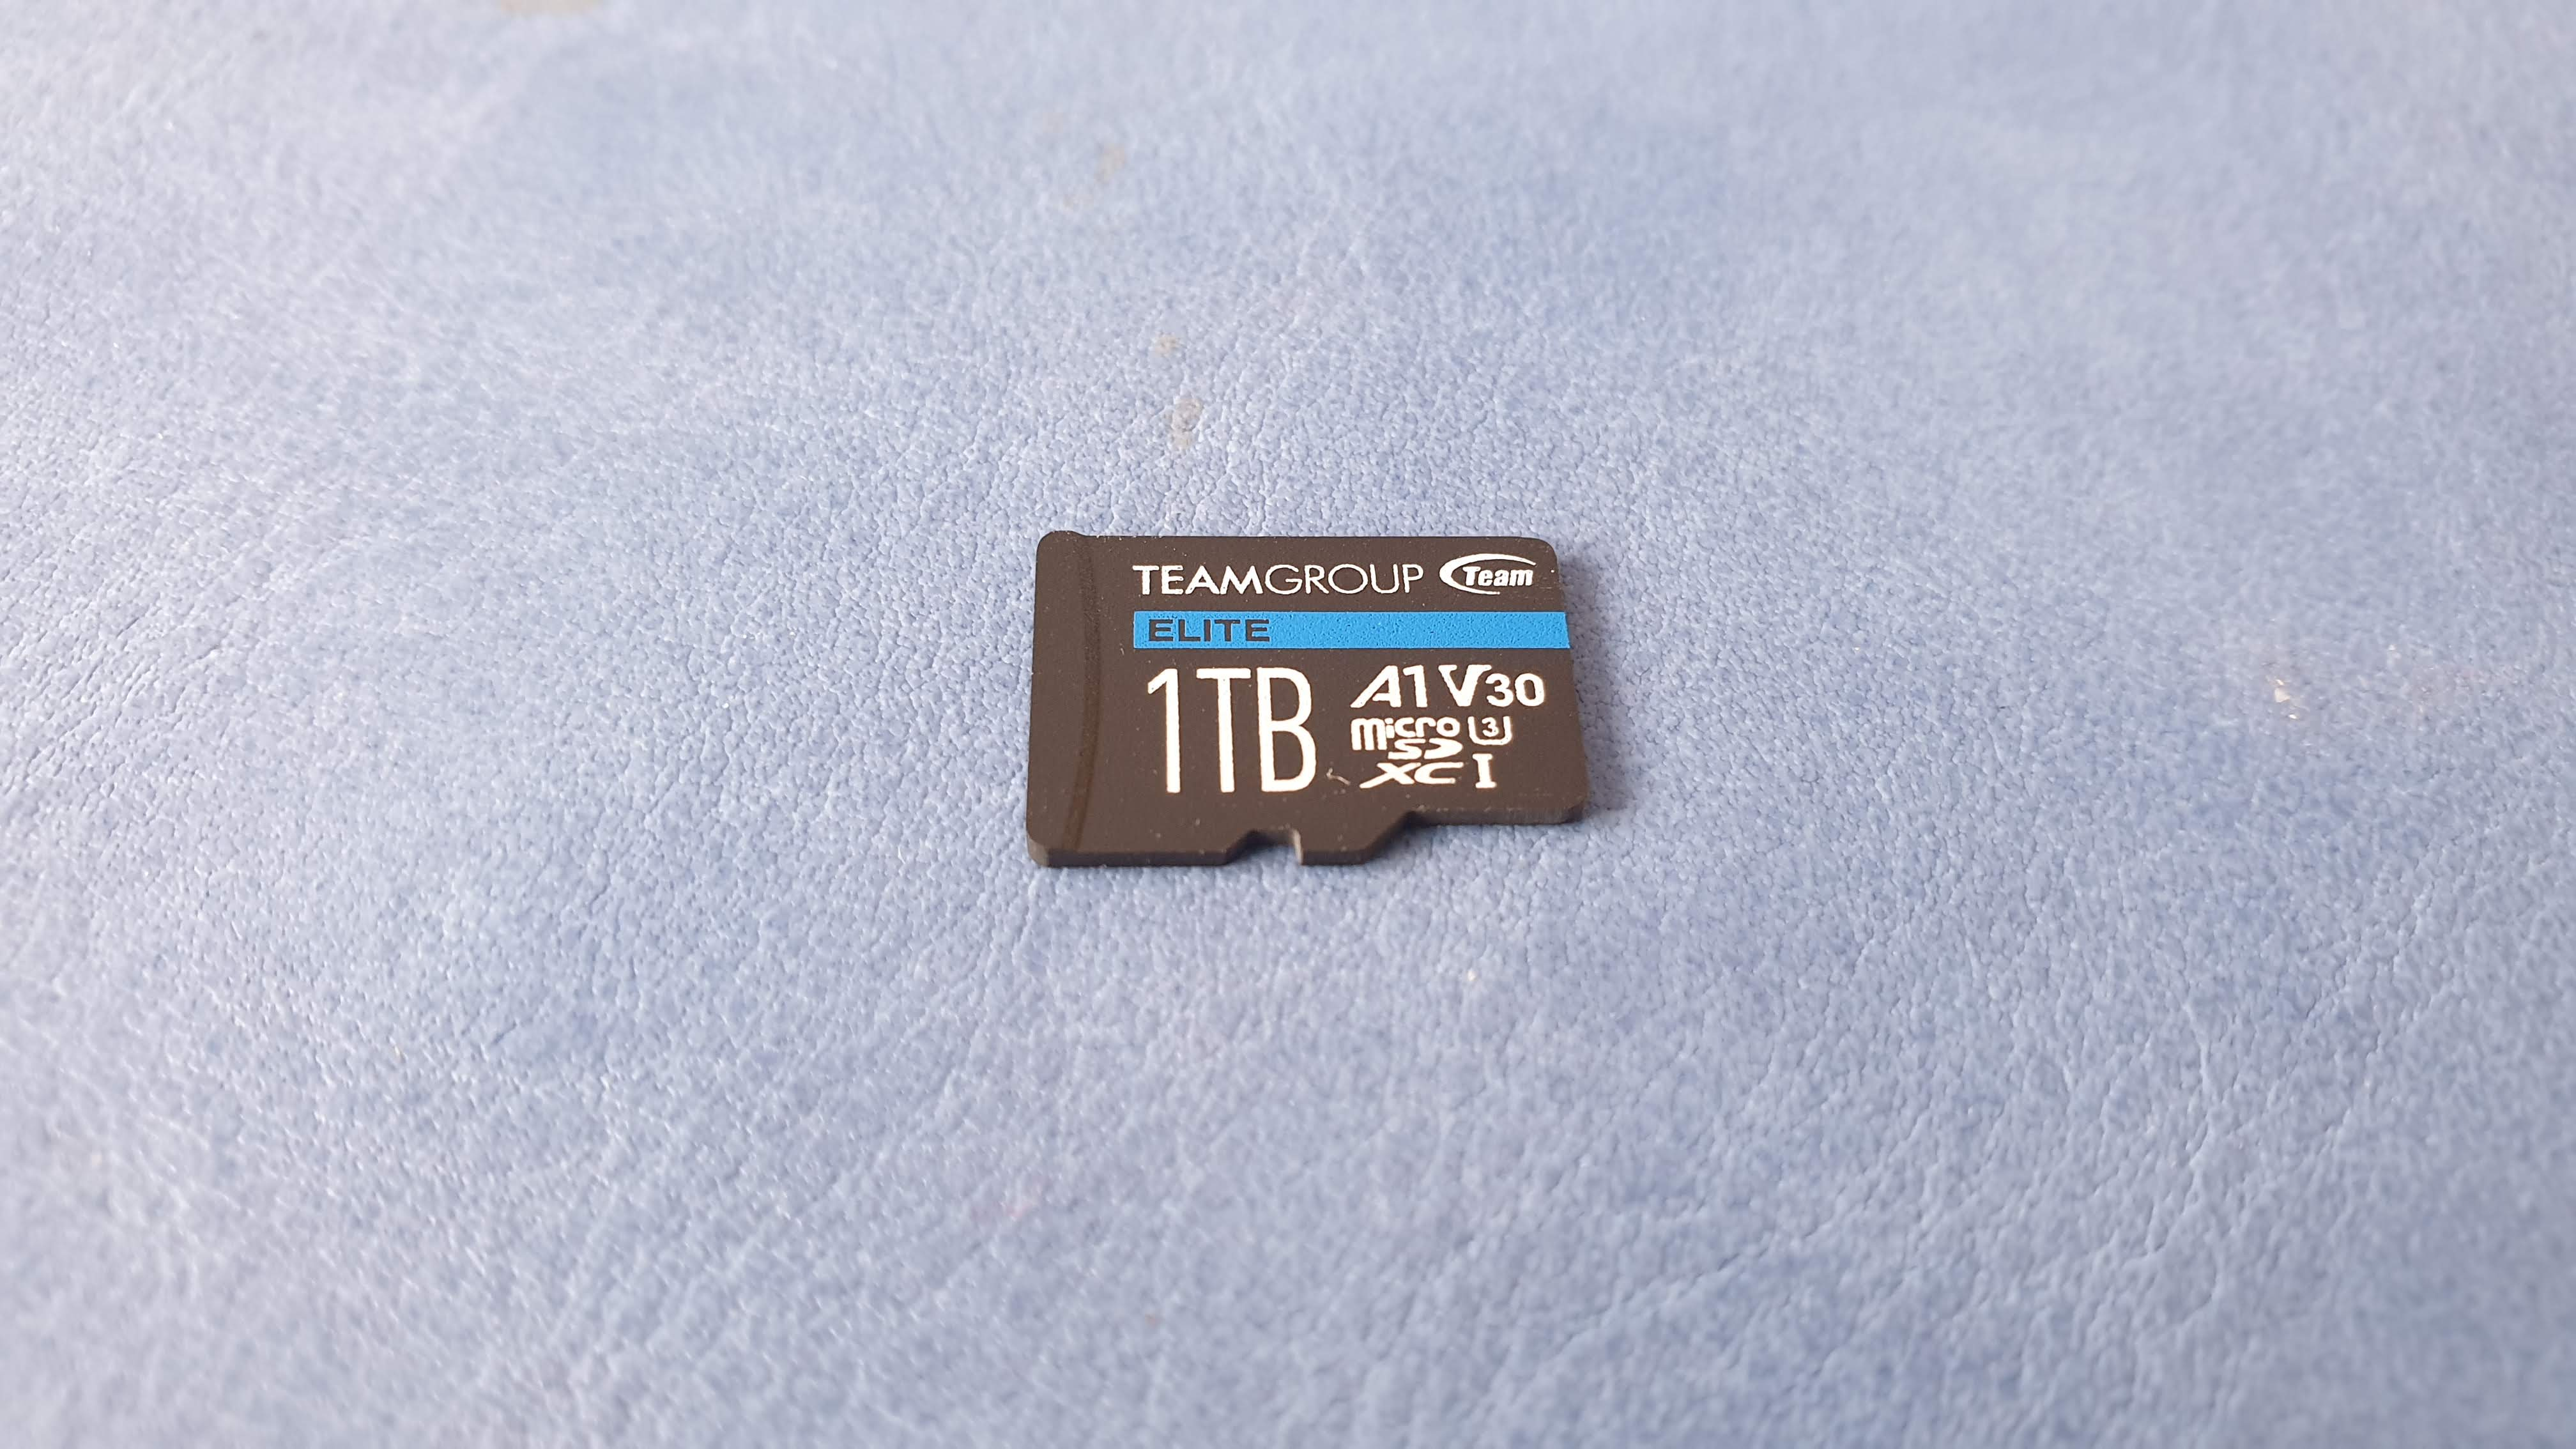 Teamgroup 1TB Elite A1 microSD card